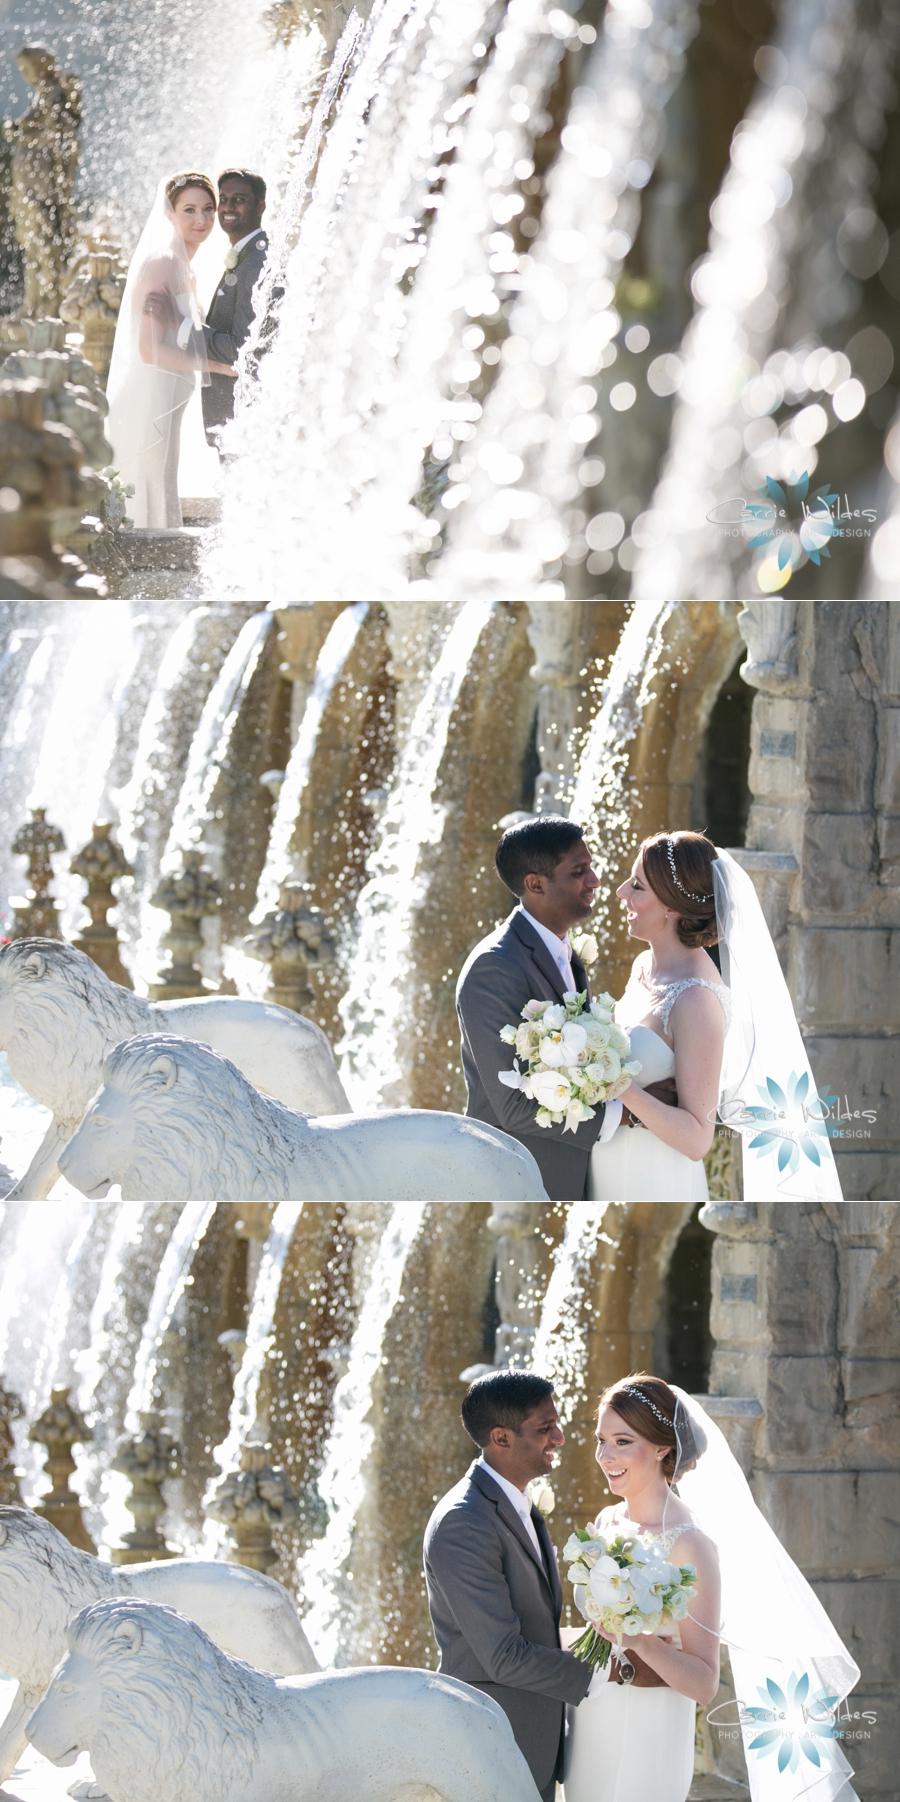 4_23_16 Kapok Tree Wedding_0023.jpg